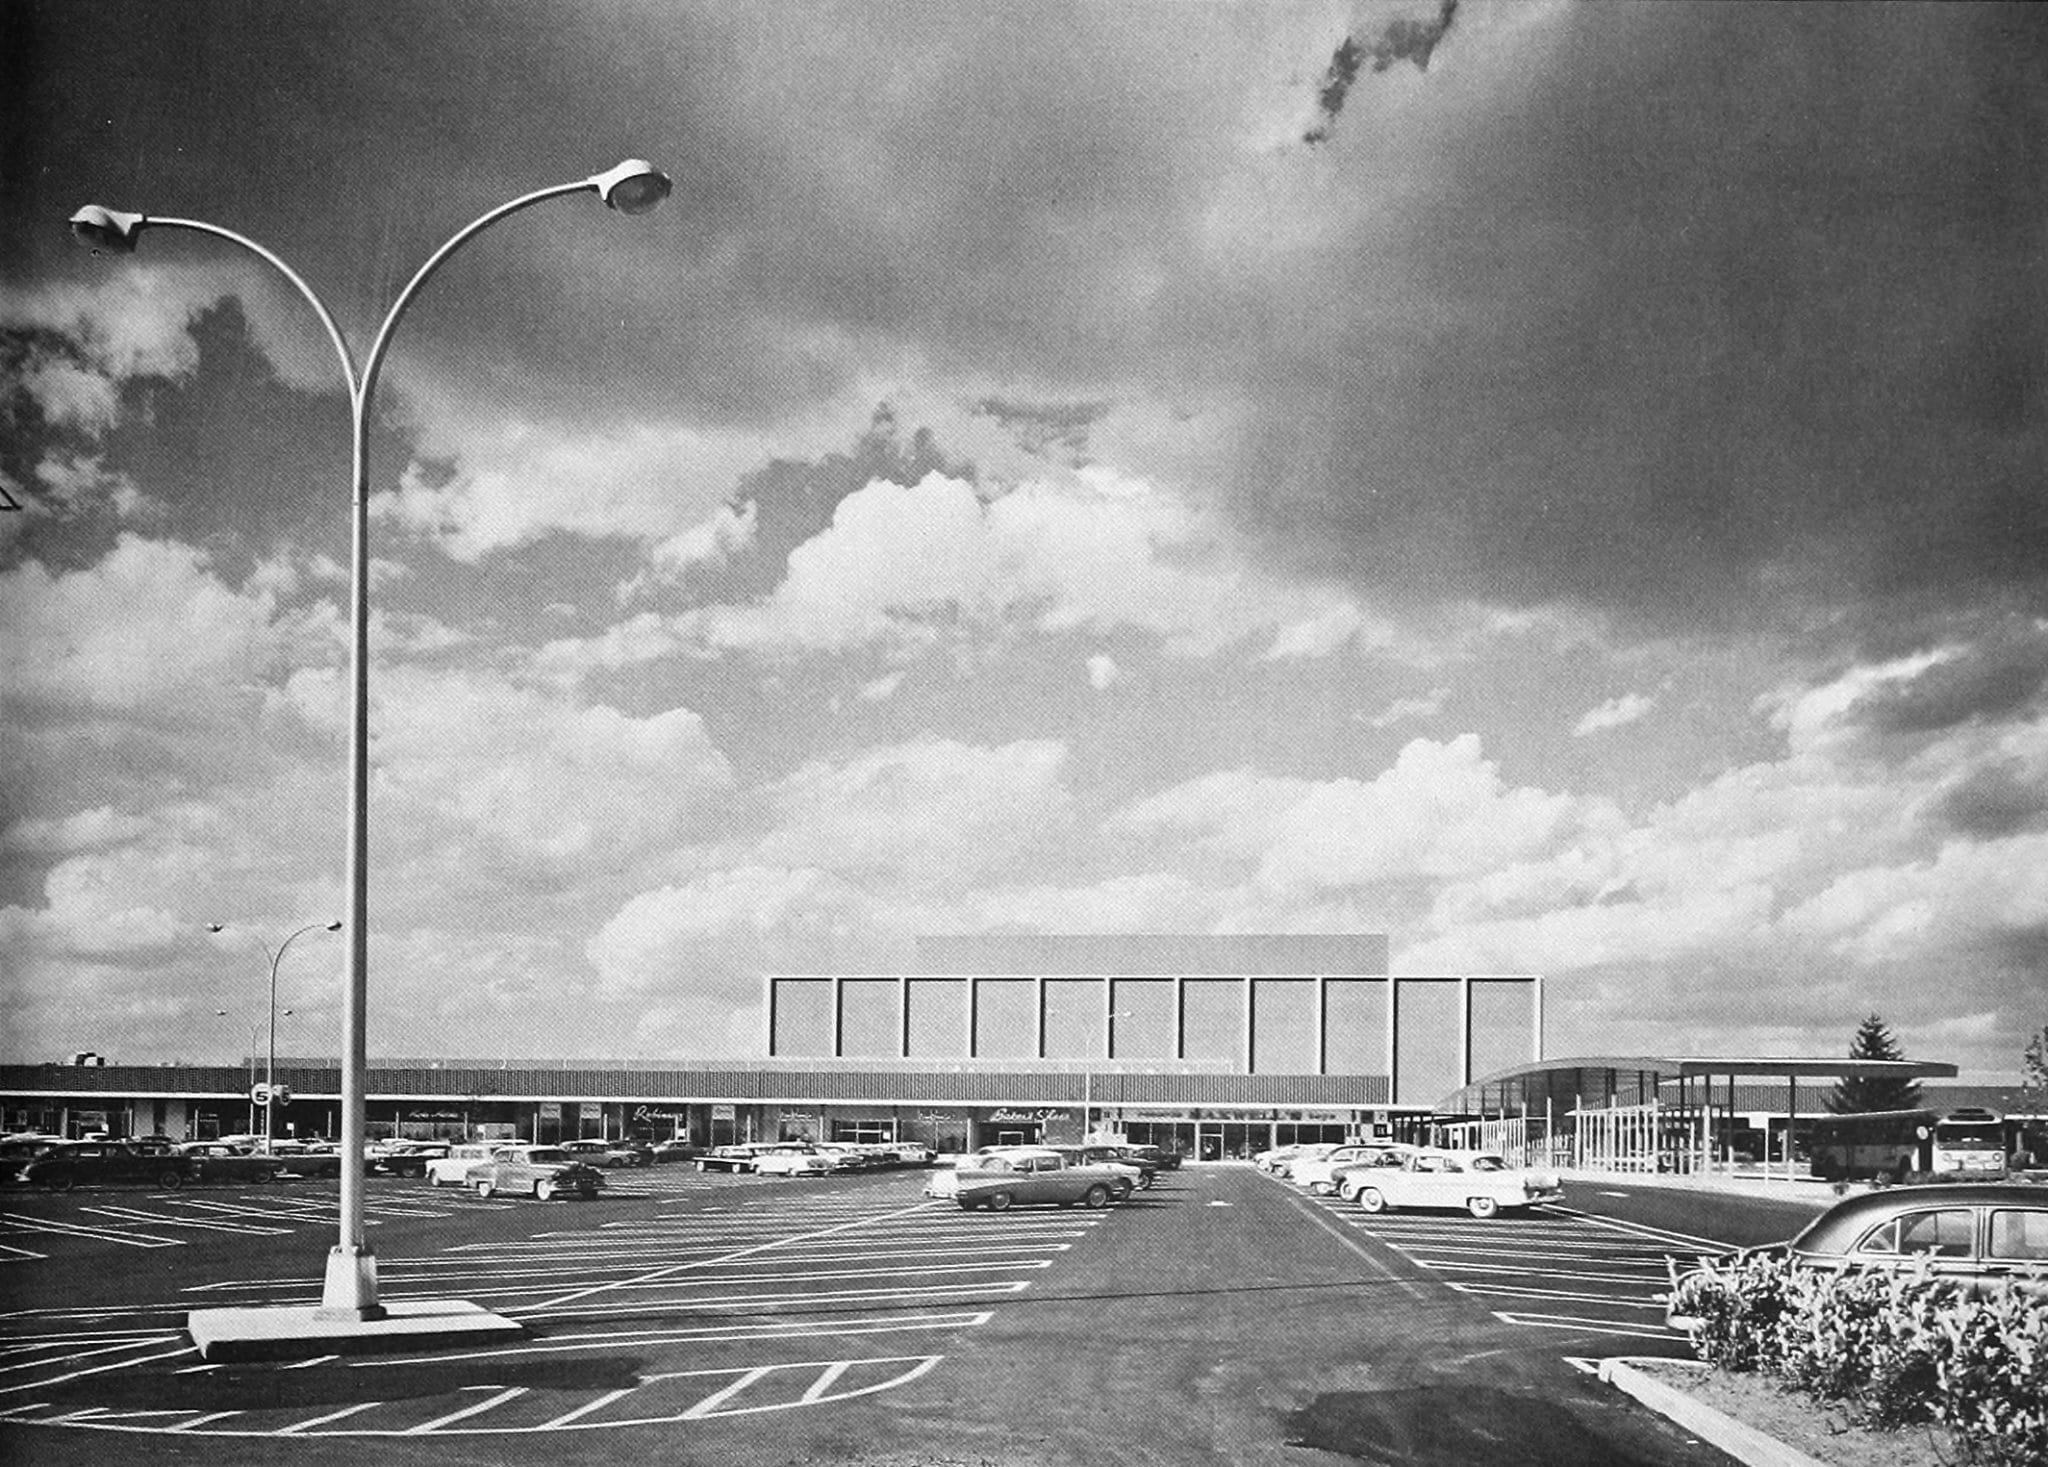 Southdale Center (Edina, Minnesota, USA) ulkonäkymä